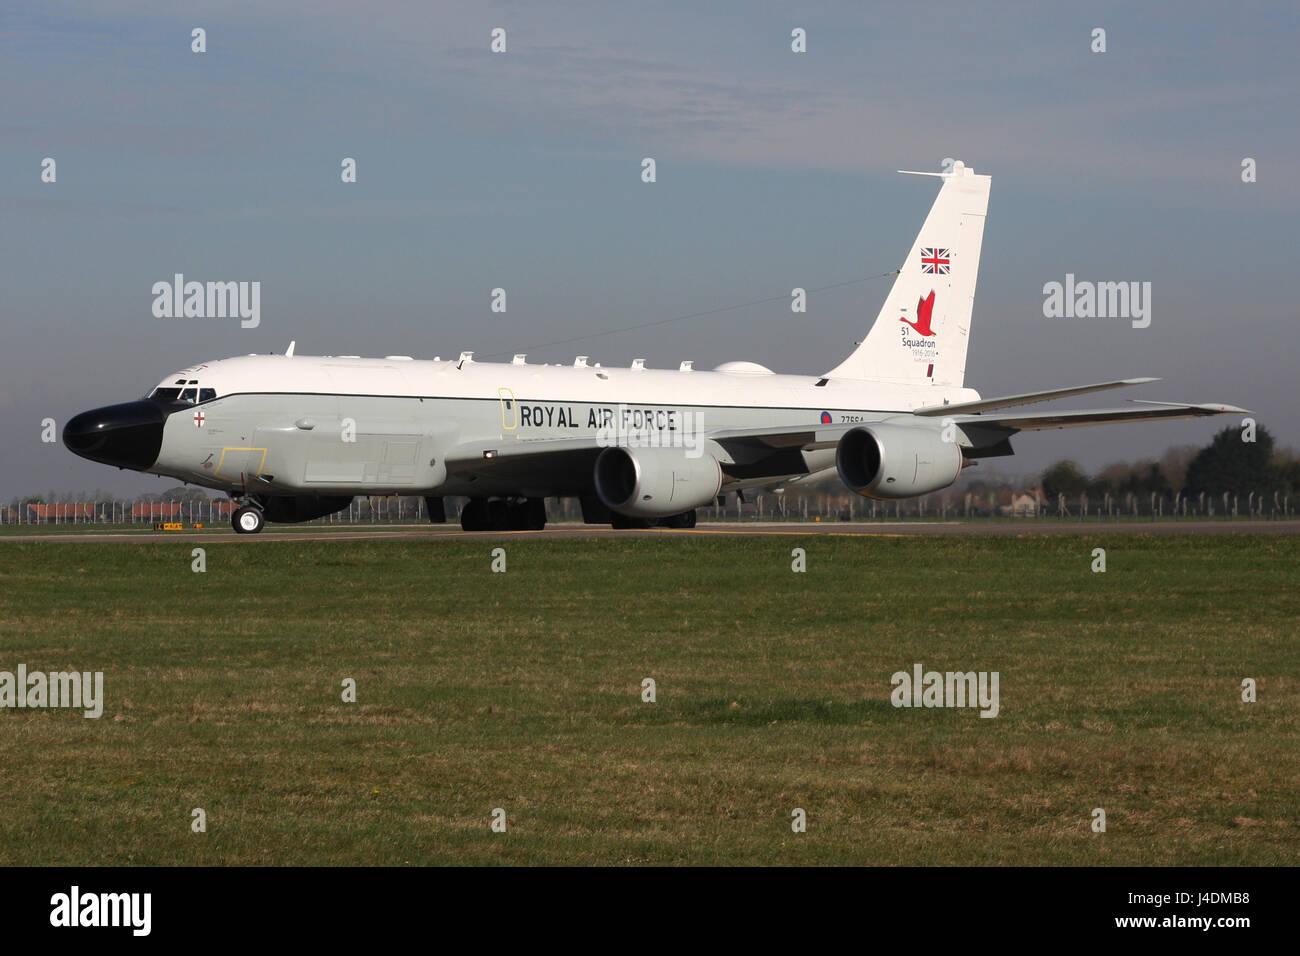 RAF RC135 AIRSEEKER RIVET JOINT Stockfoto